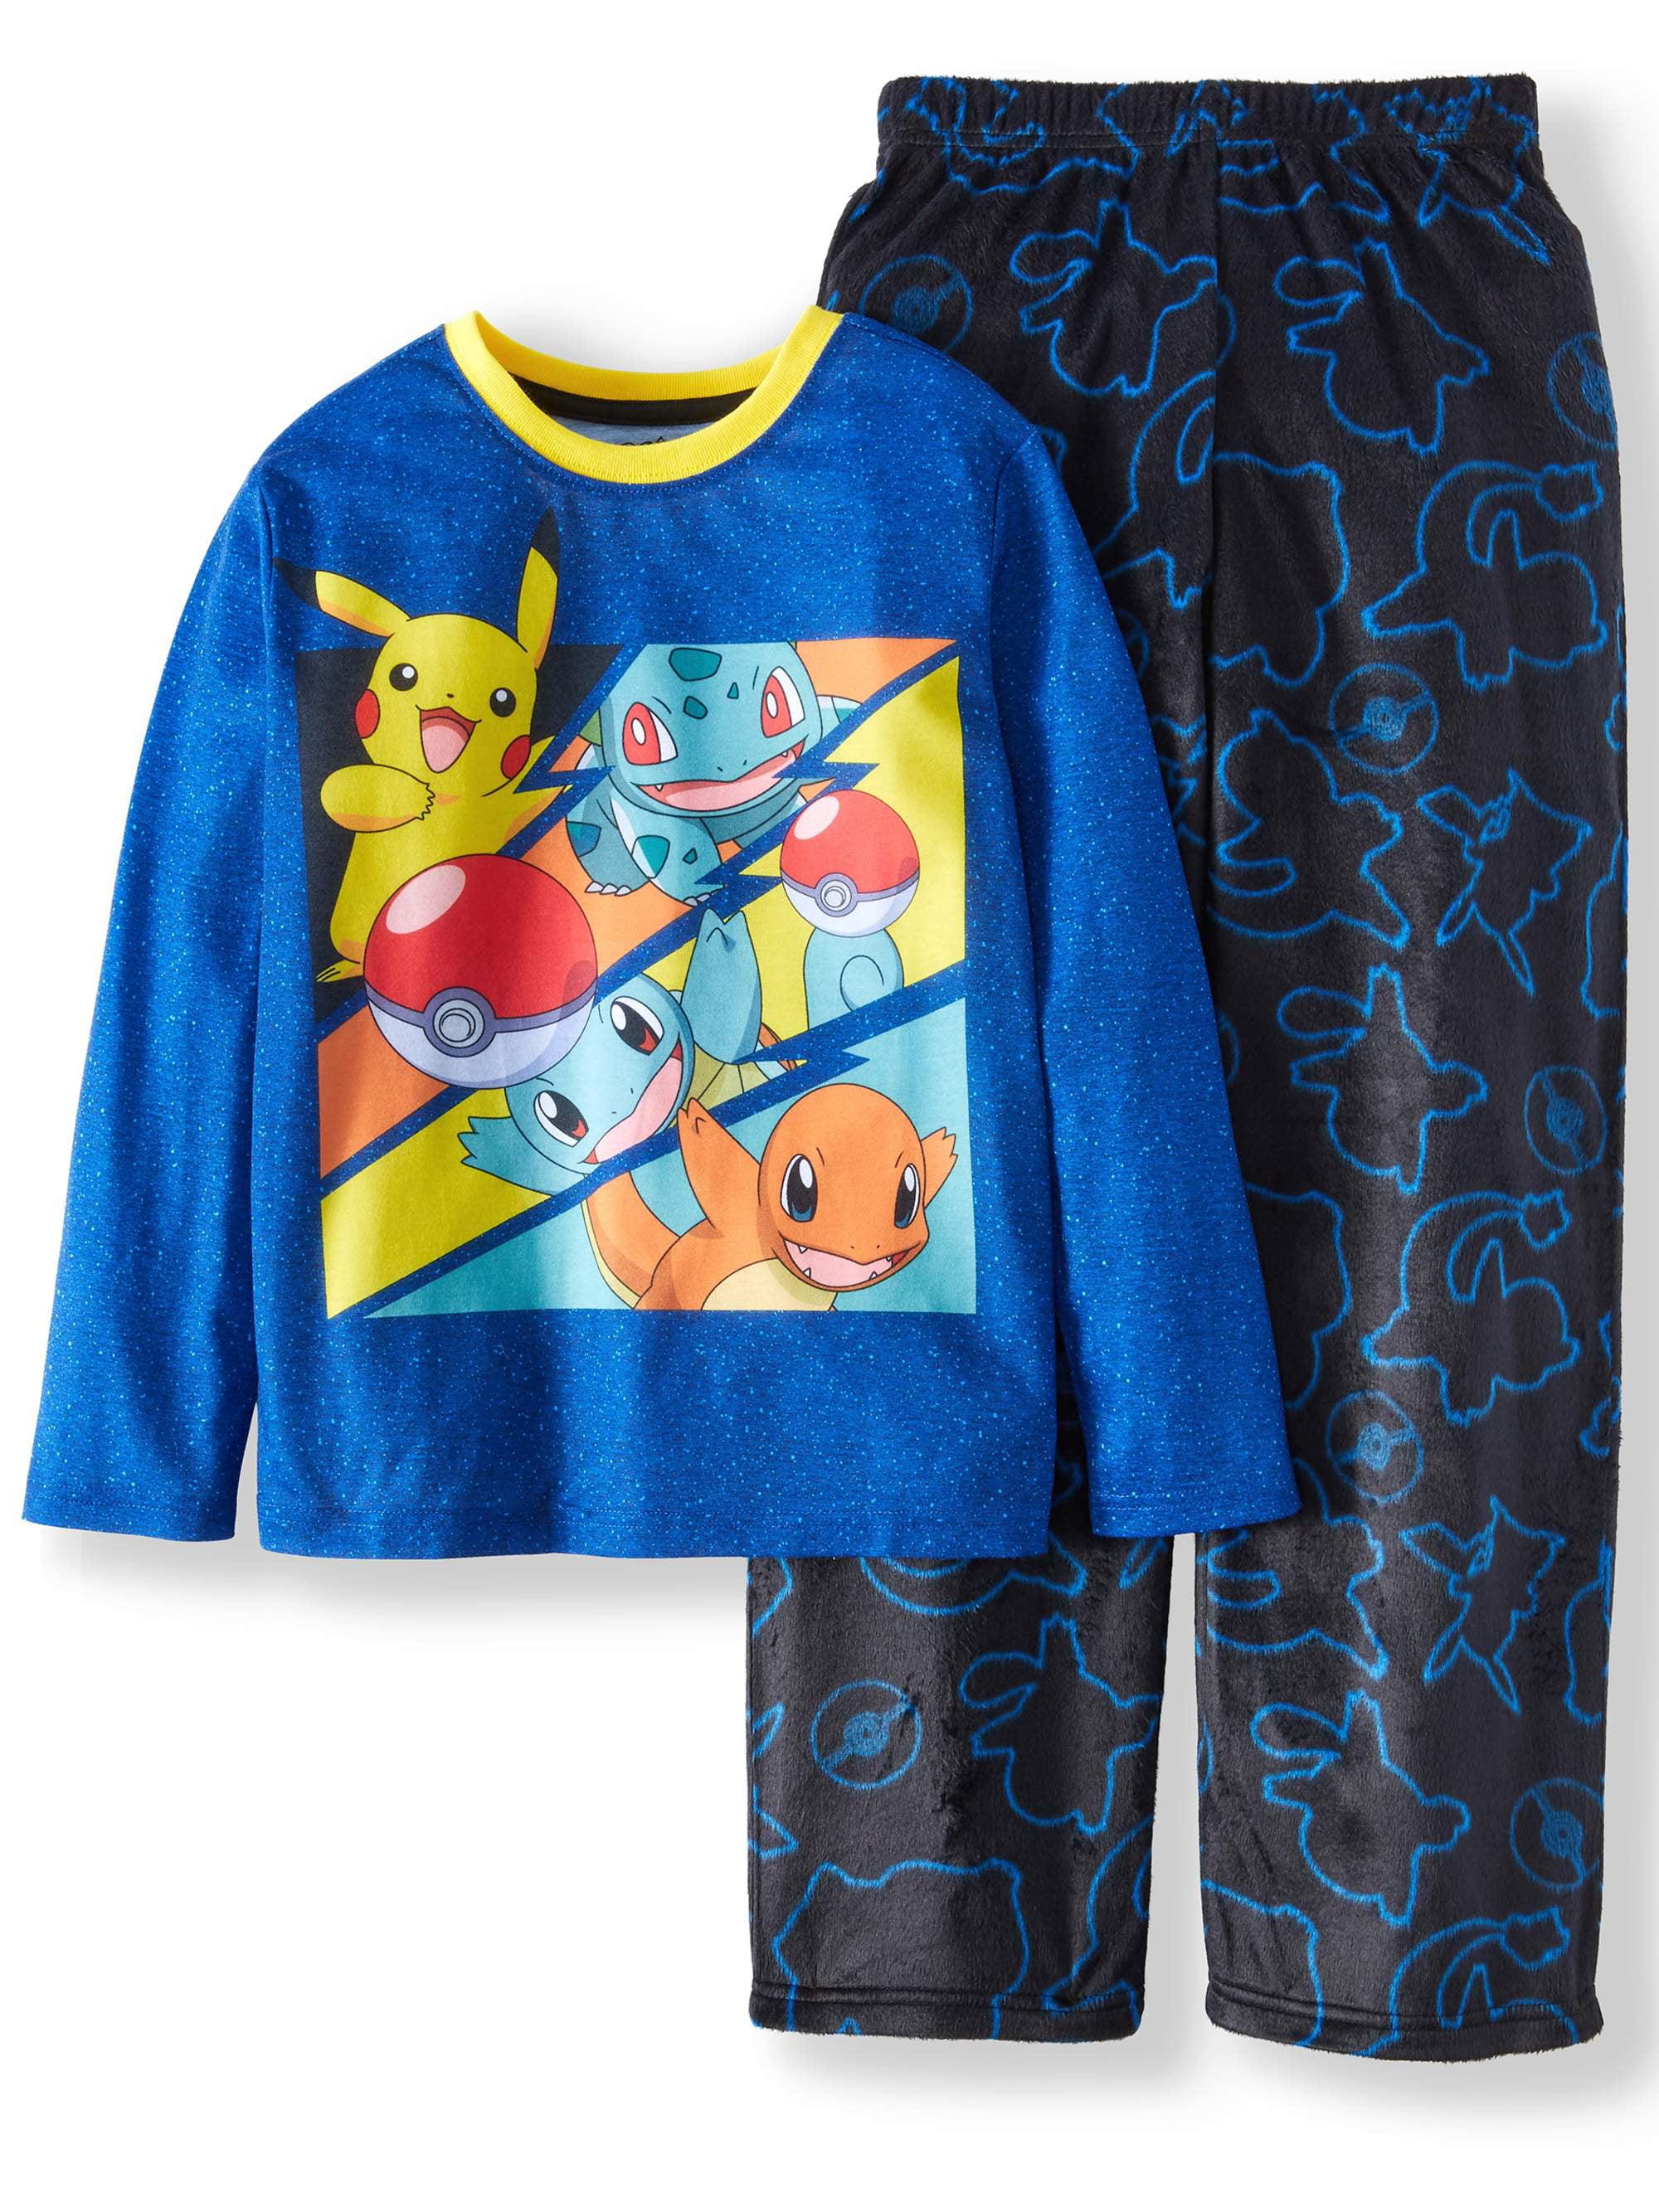 16b4d5012 Pokemon Fleece 2 Piece Pajama Sleep Set (Little Boy   Big Boy ...